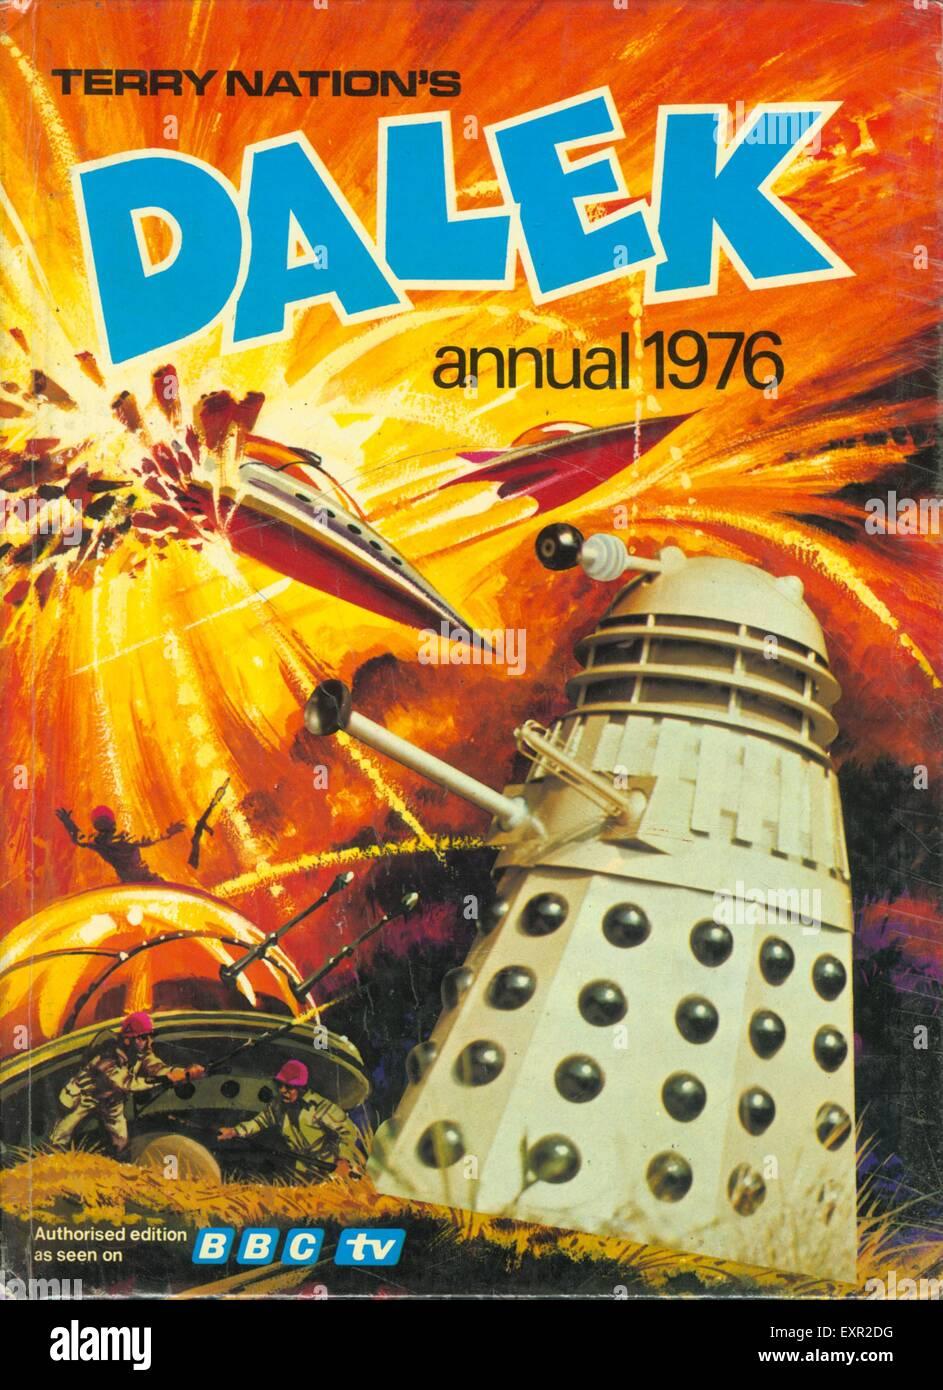 1970s UK Daleks Comic/ Annual Cover - Stock Image